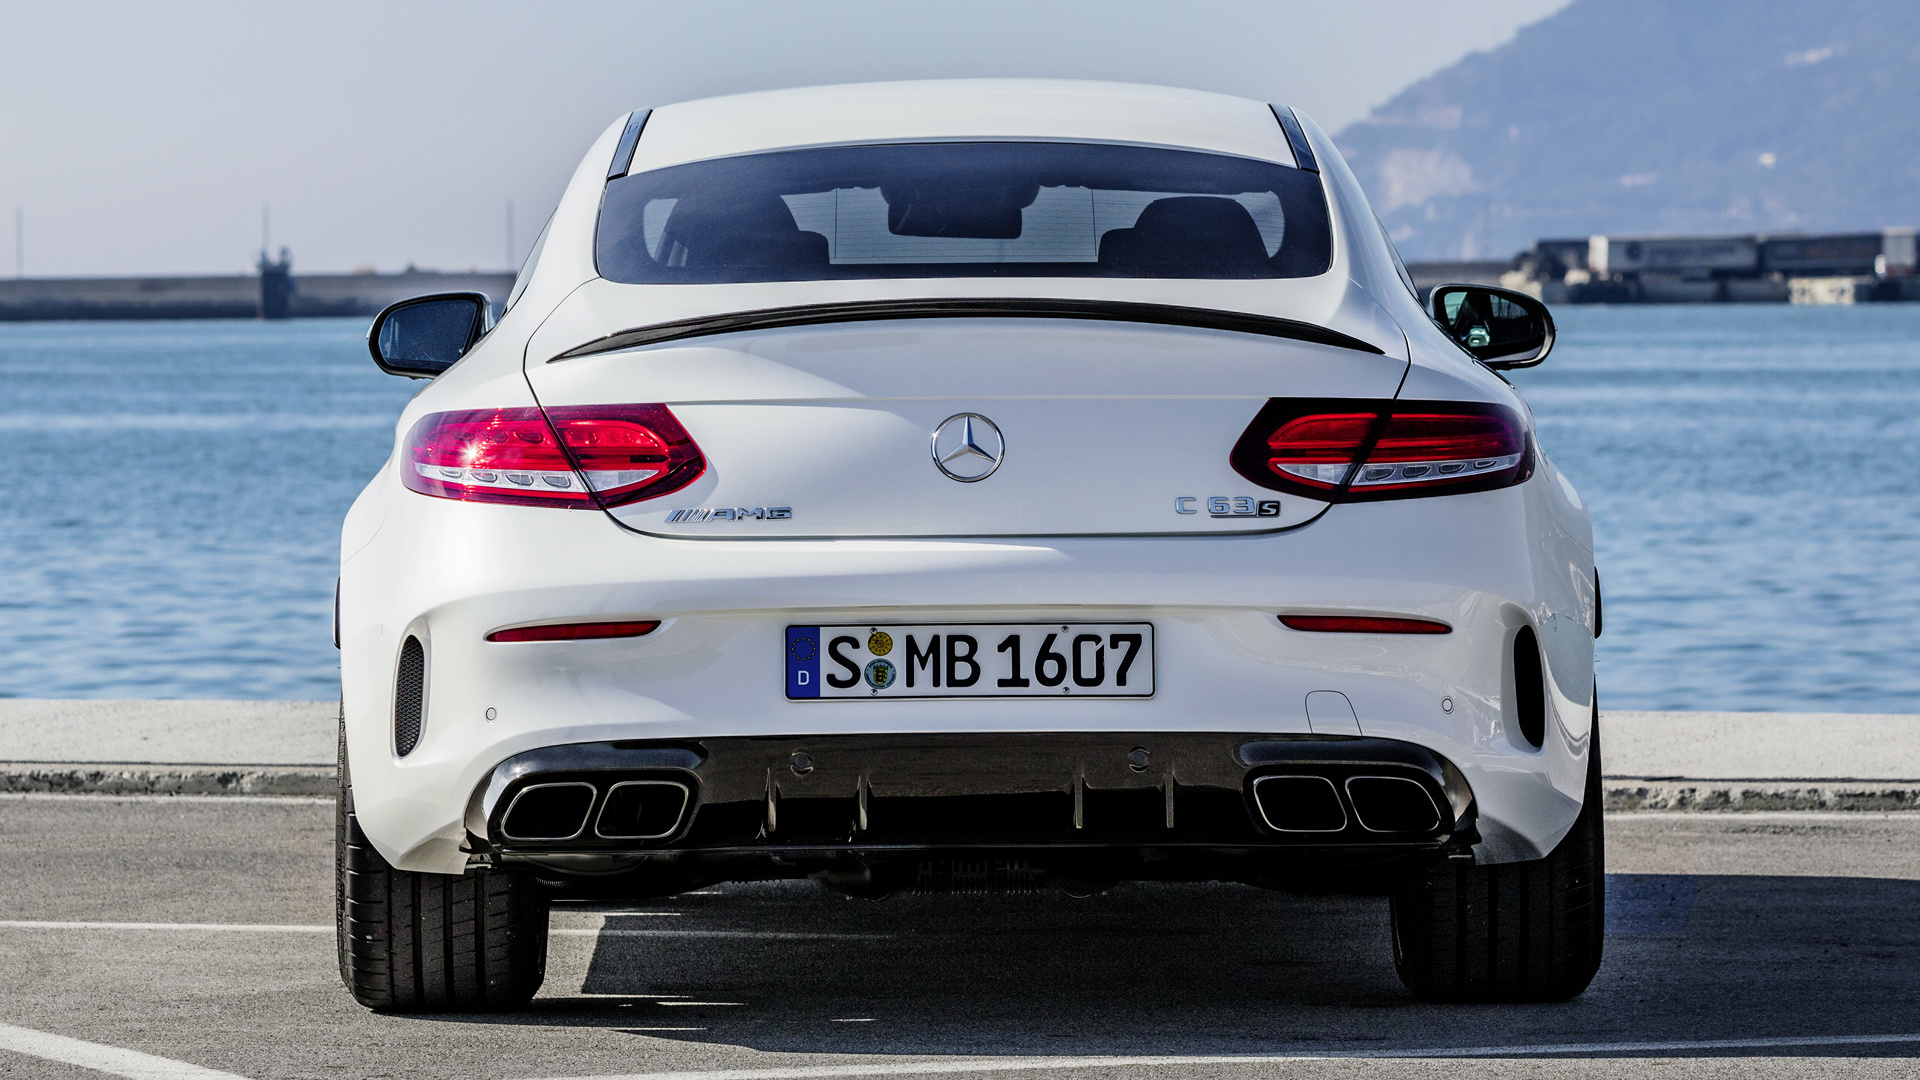 2018 Mercedes Amg C 63 S Coupe Papel De Parede Hd Plano De Fundo 1920x1080 Id 926590 Wallpaper Abyss